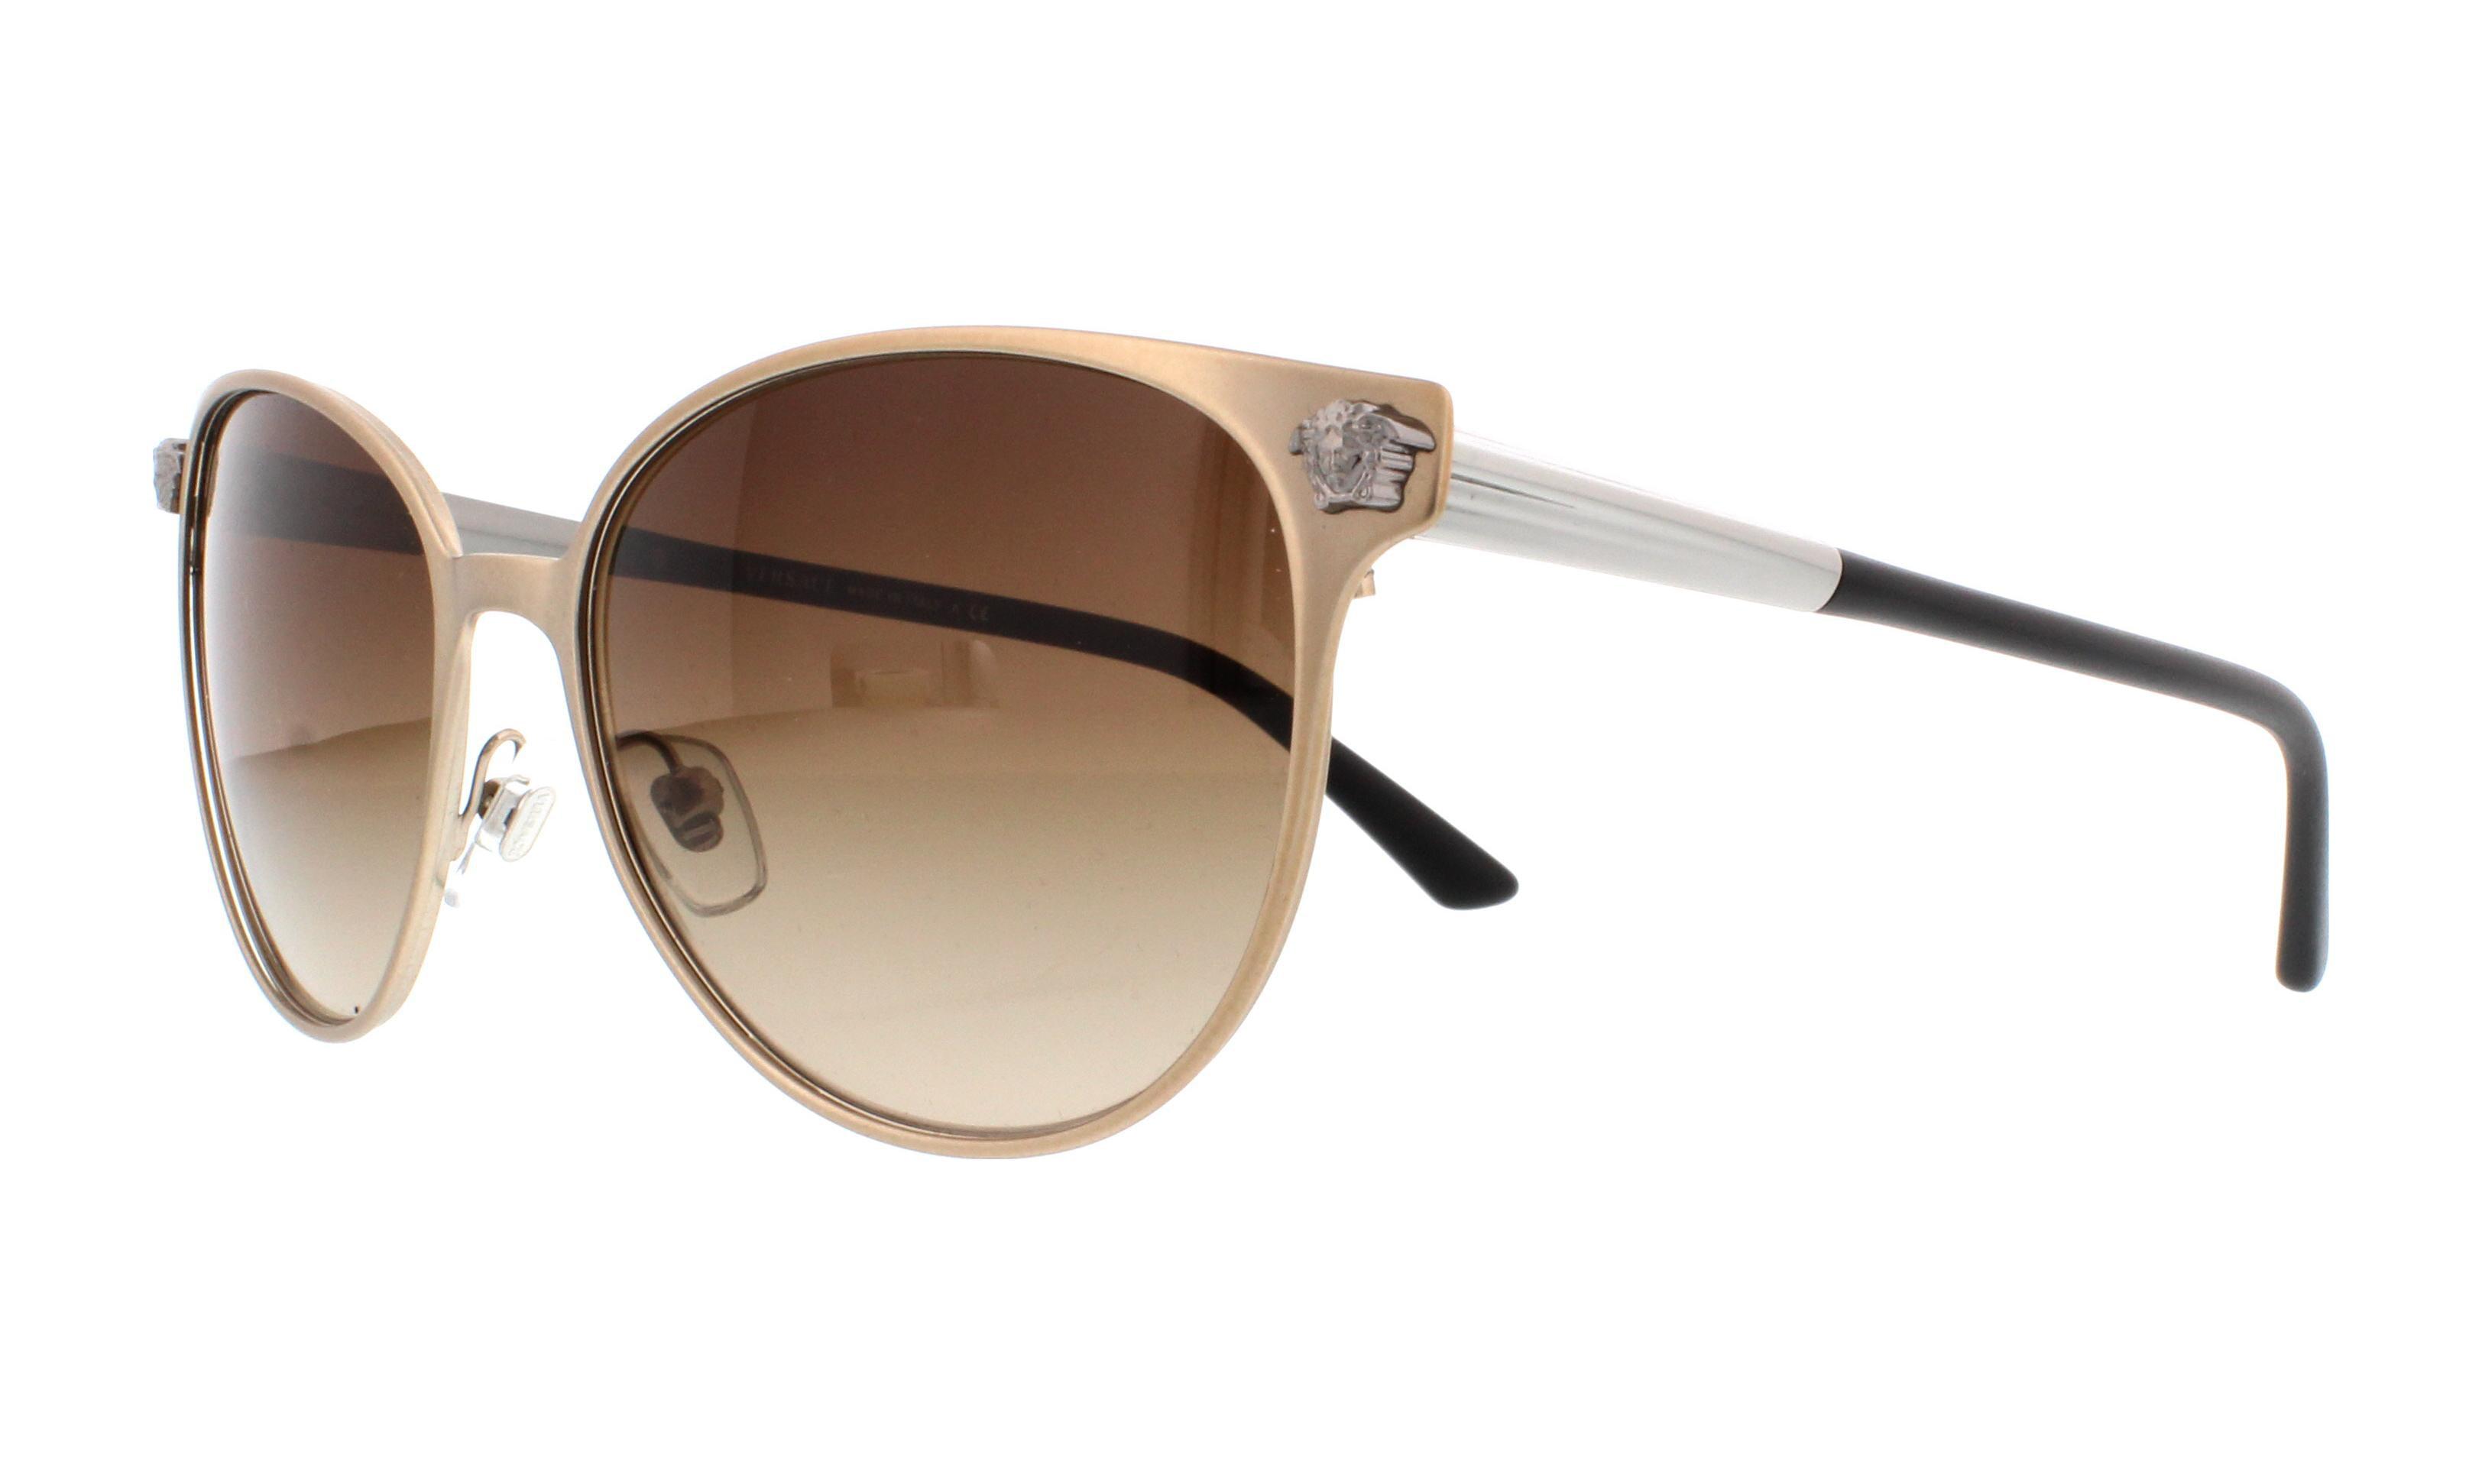 f0575da552ab Versace - VERSACE Sunglasses VE 2168 137513 Matte Copper 57MM - Walmart.com